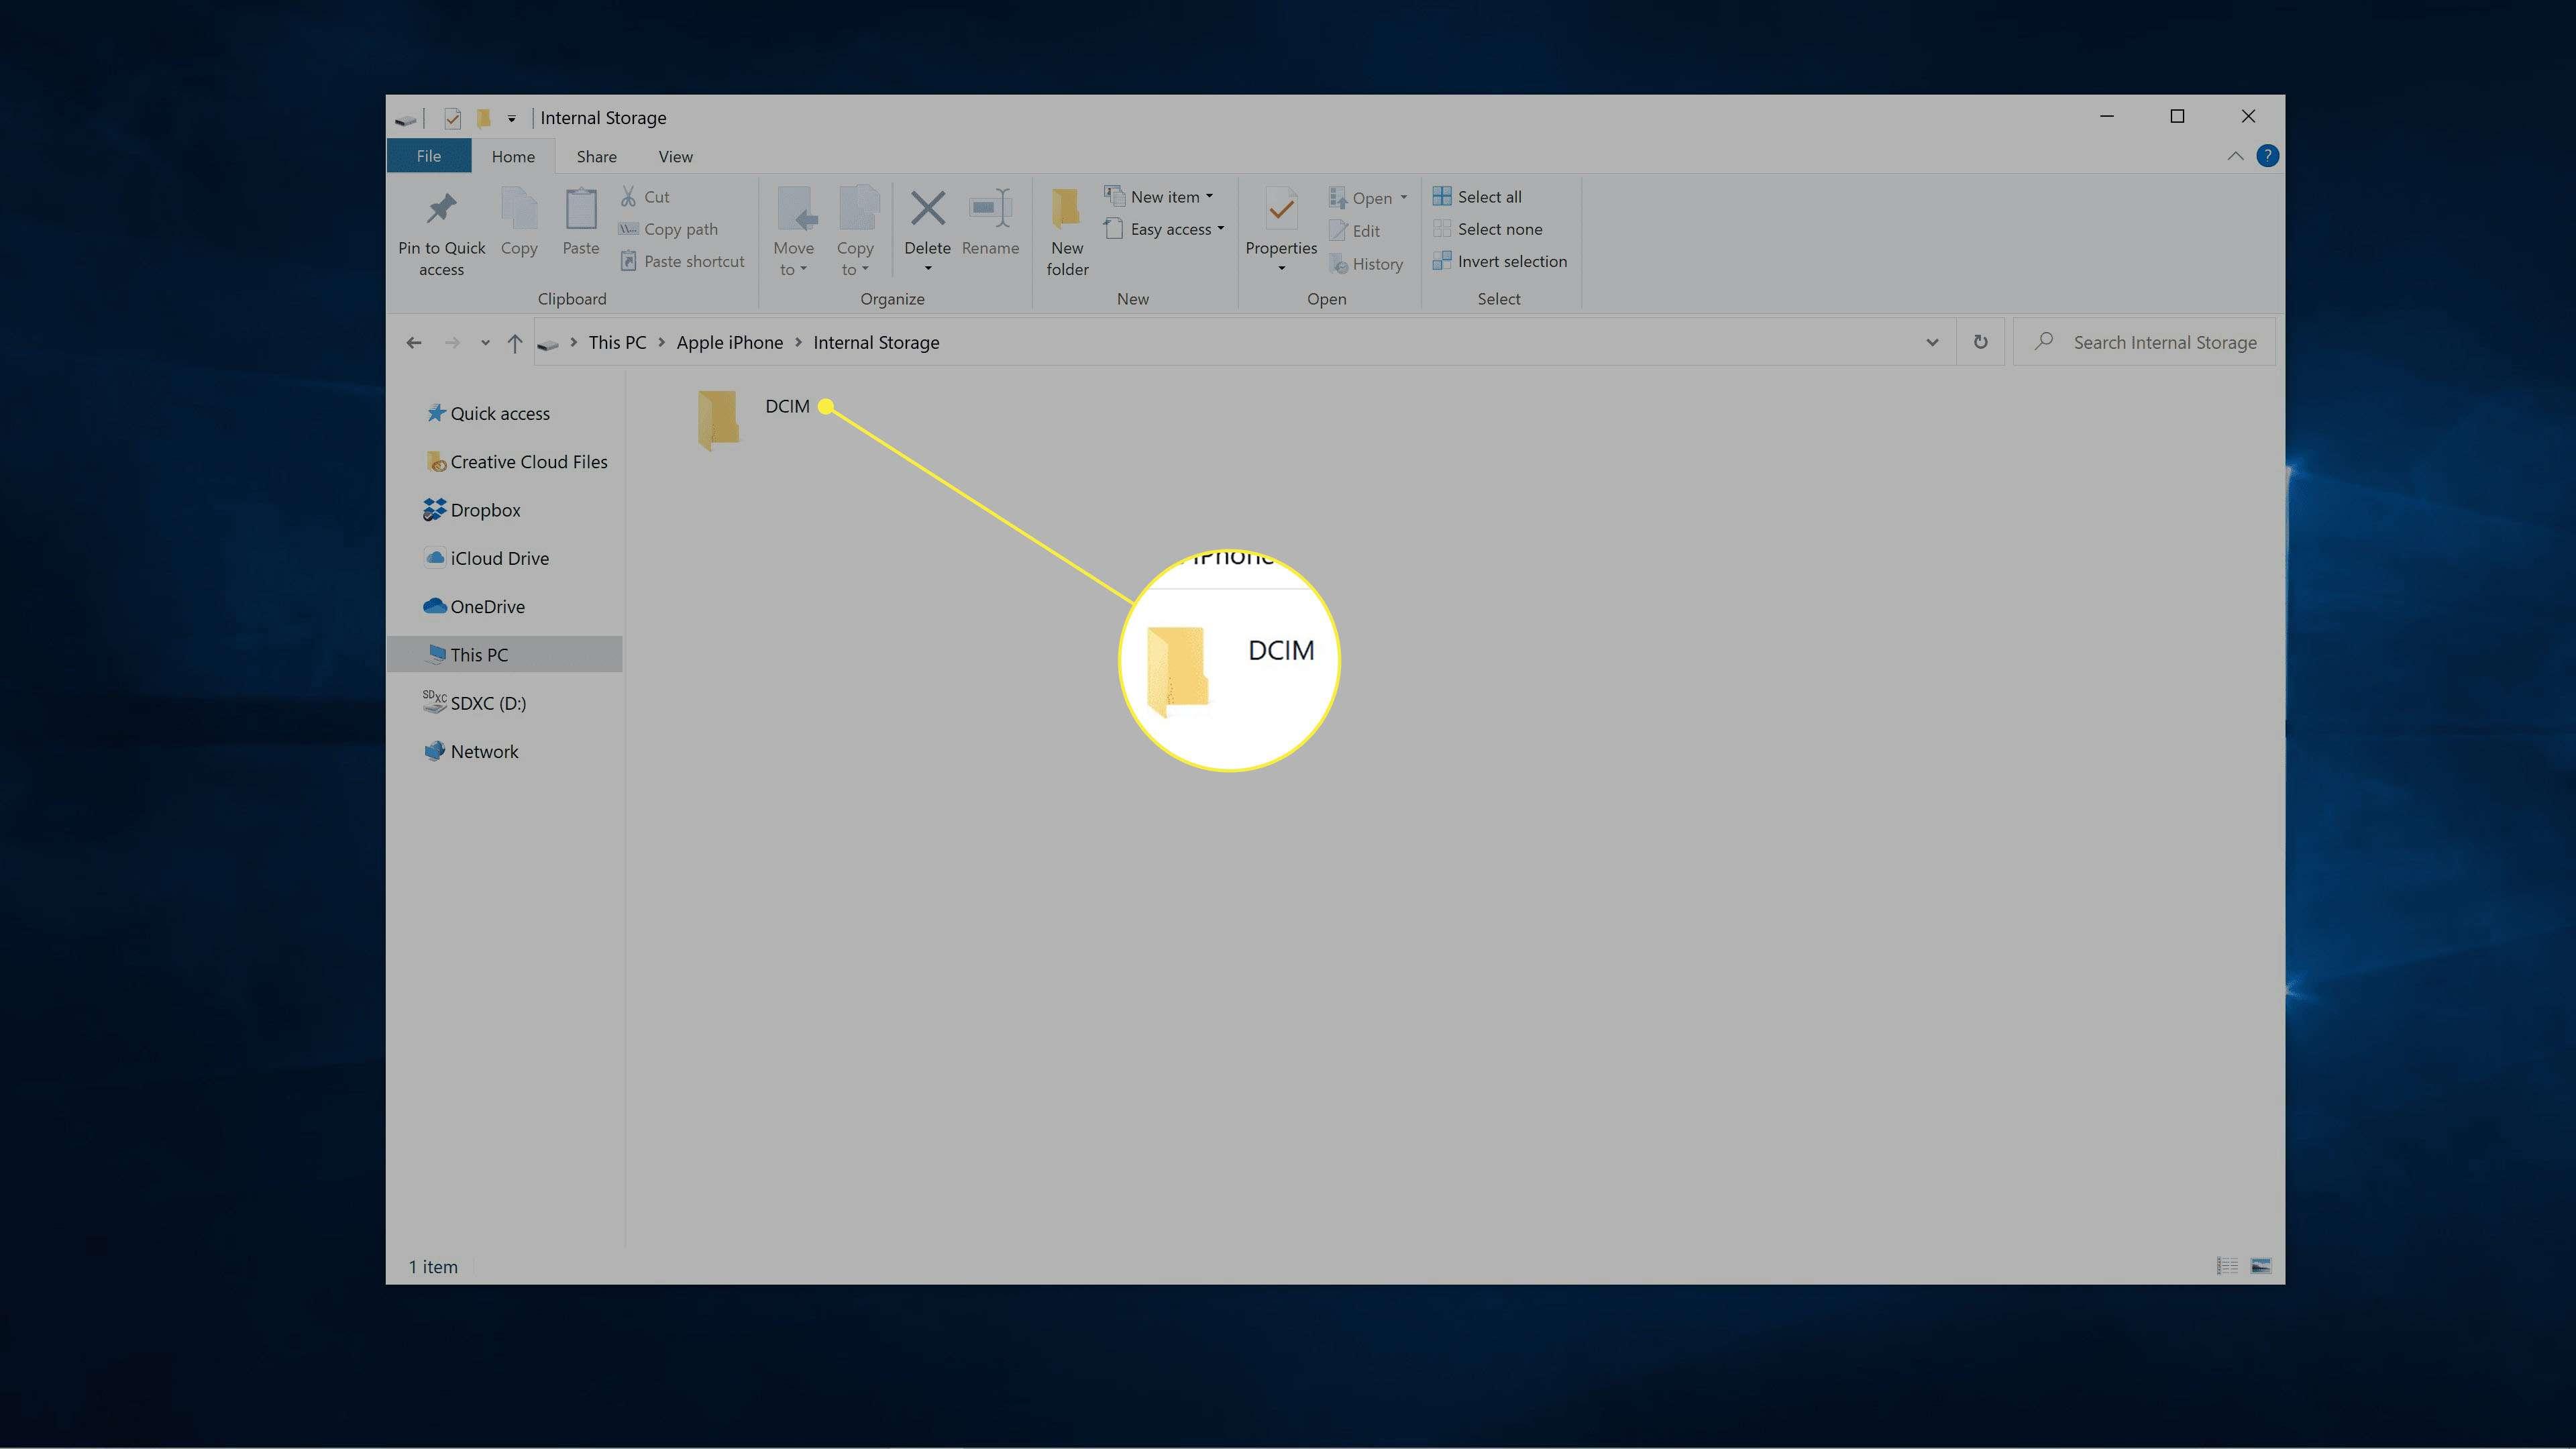 DCIM highlighted in Windows file explorer.